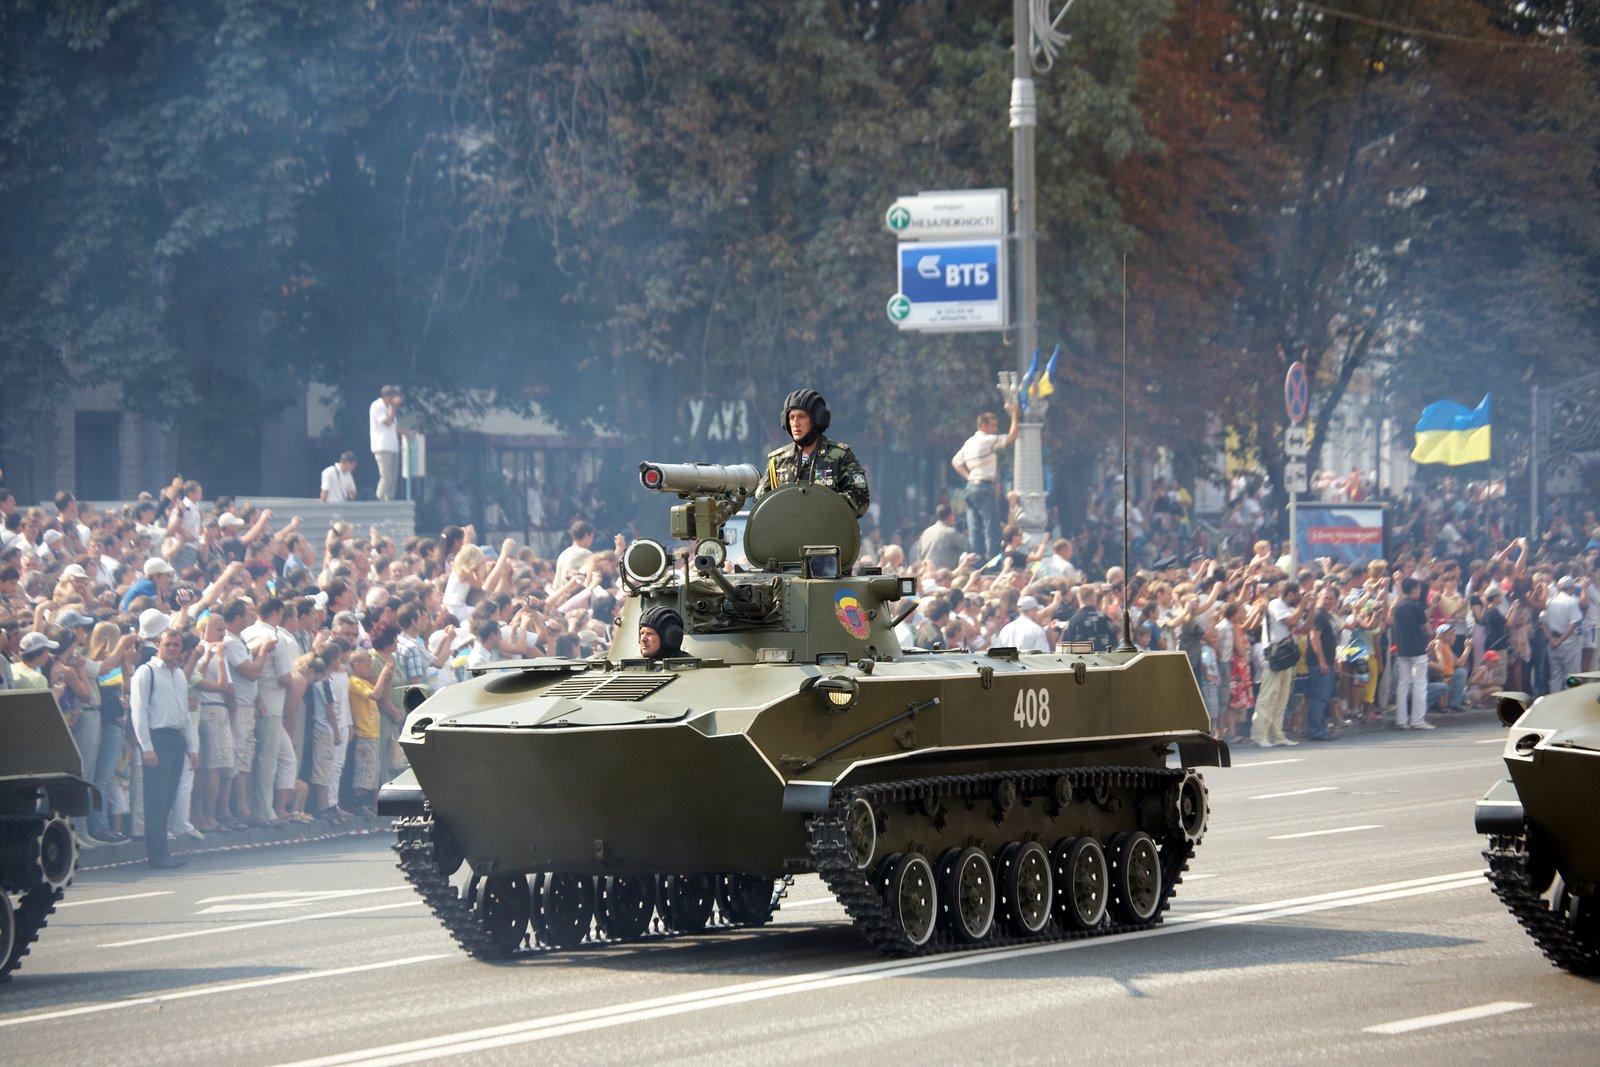 Ukrainian_BMD-2_tank_(2).JPG